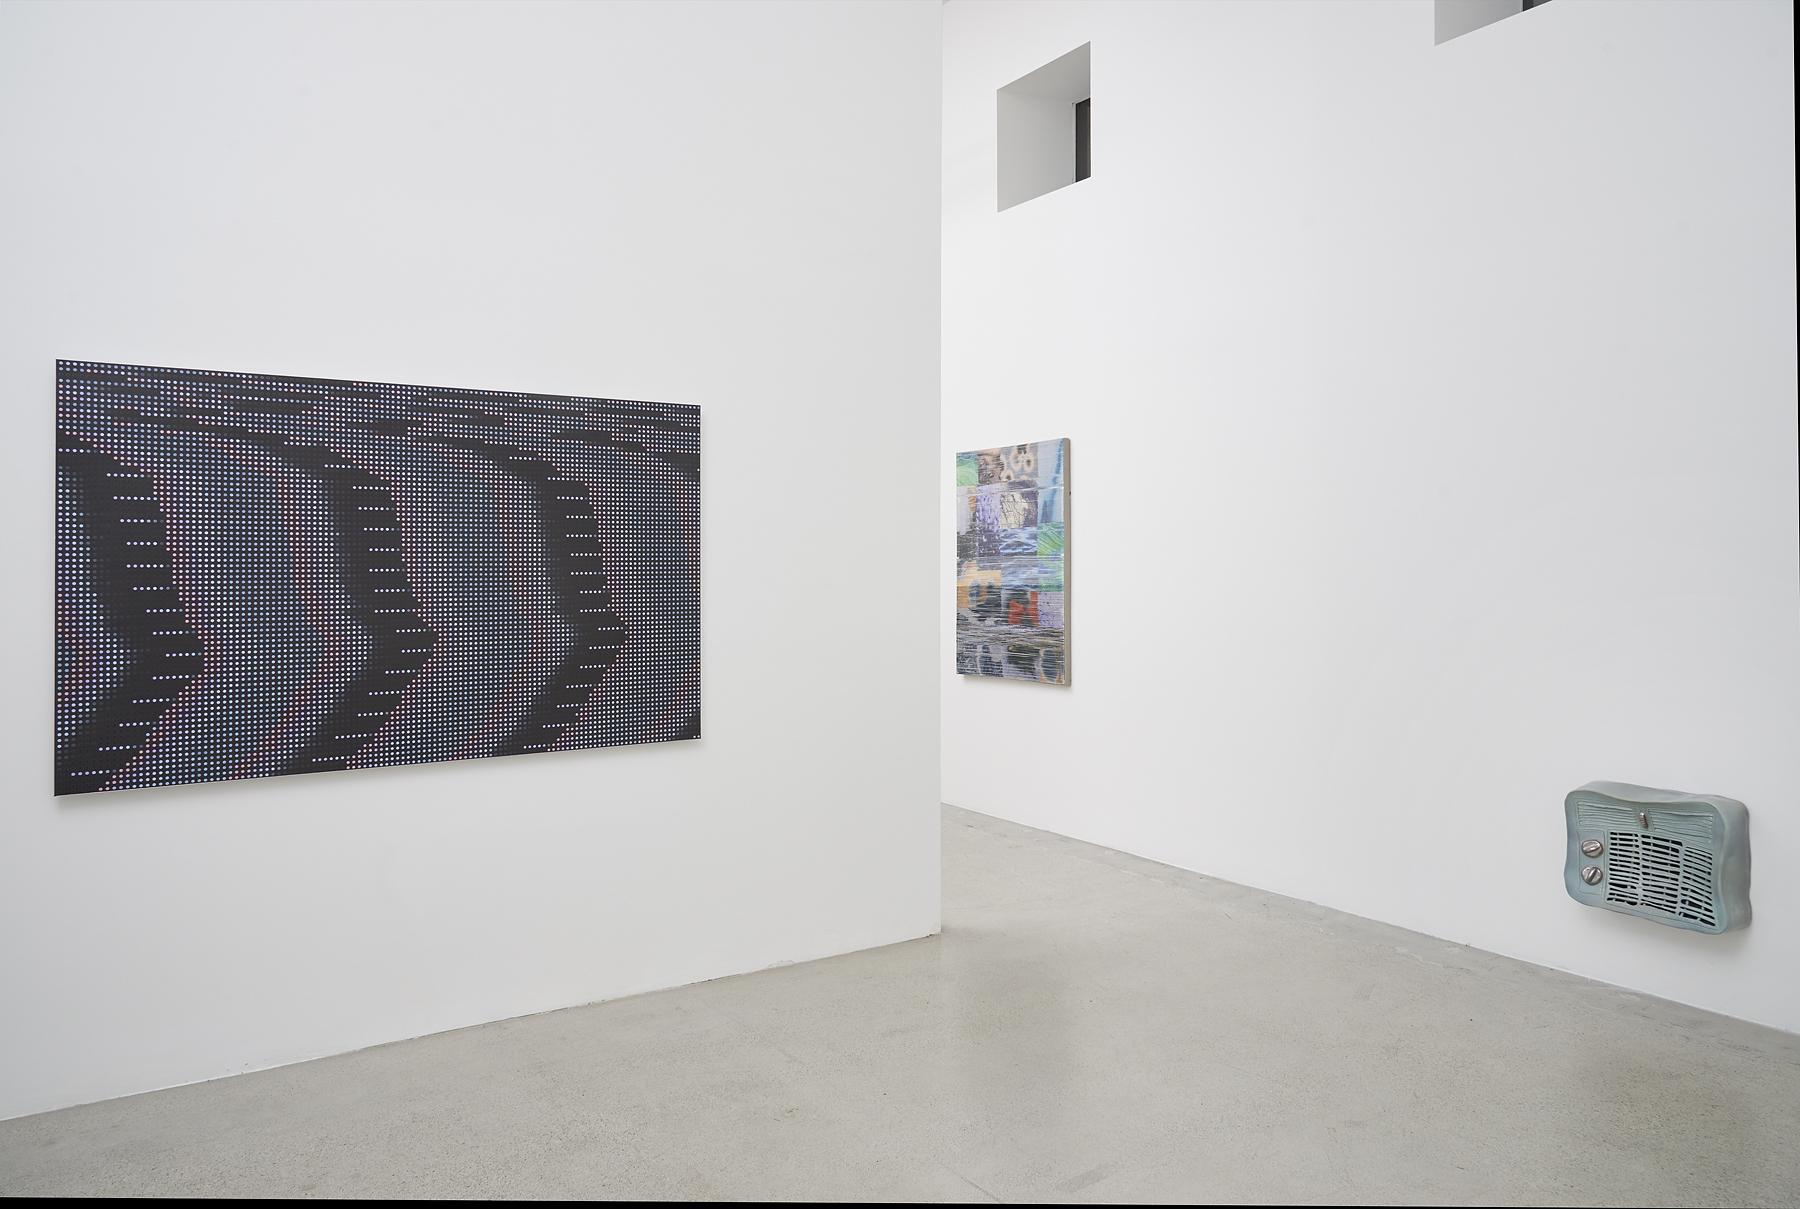 Kinship, 2018_Jessica Silverman Gallery, Installation view 02.PRS.jpg